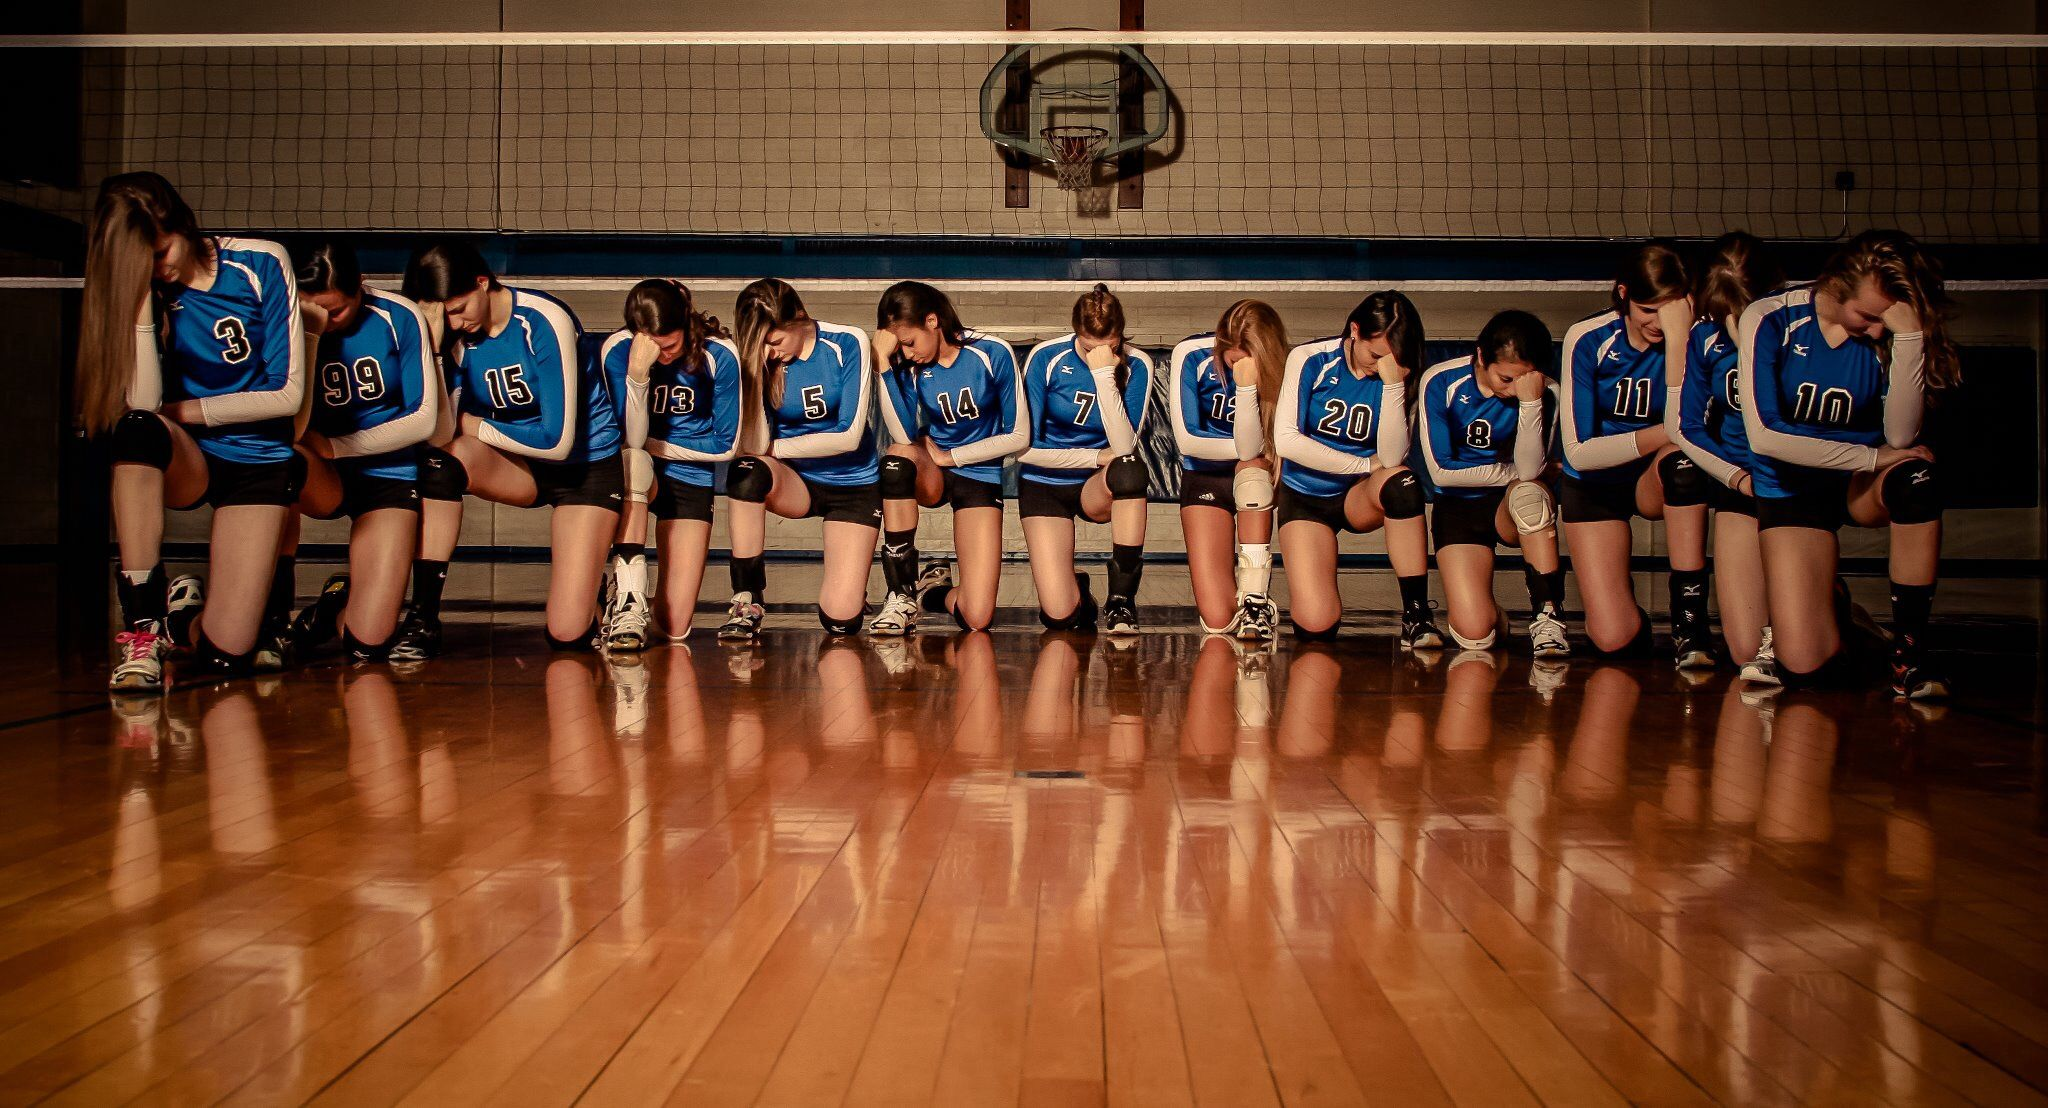 Pin On Volleyball Photo Ideas